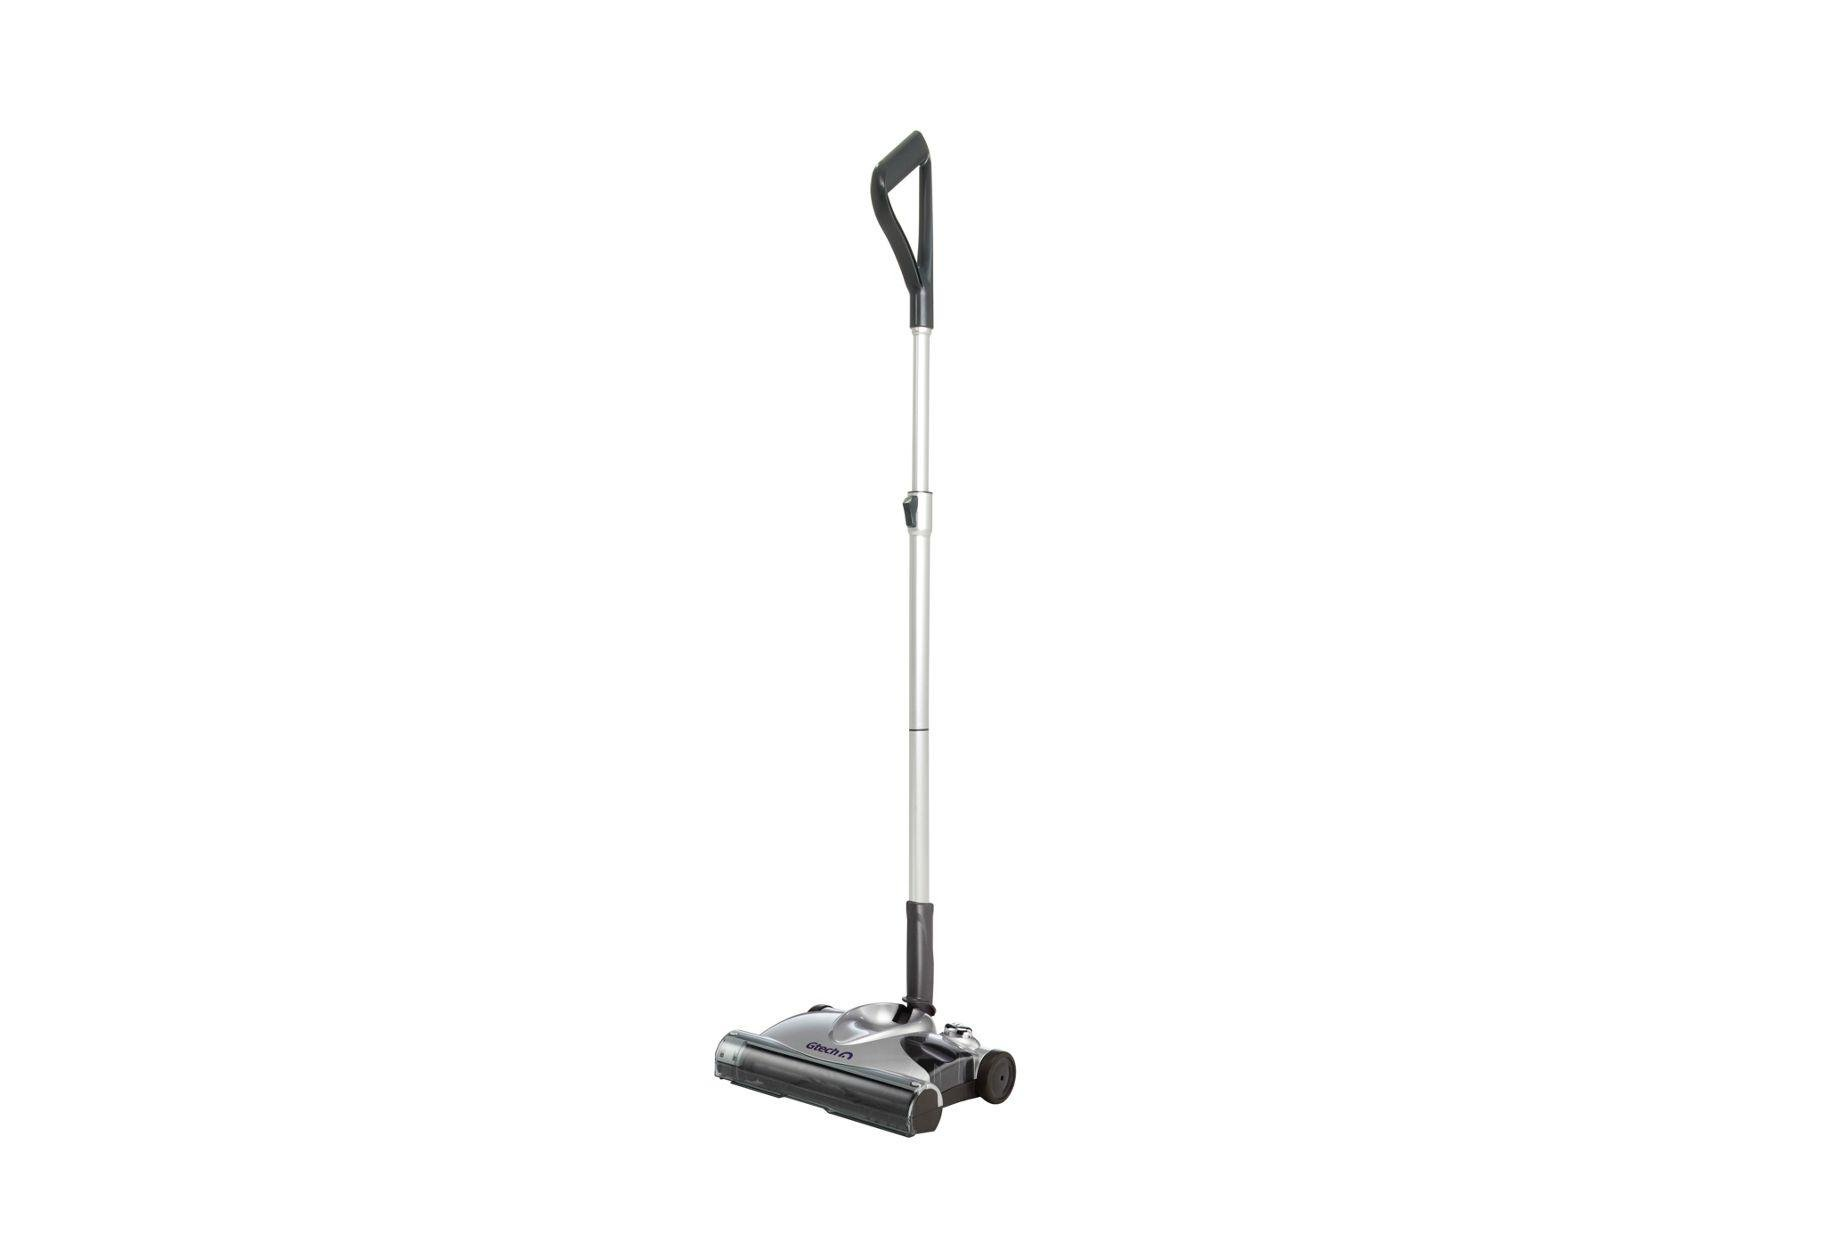 'Gtech Sw02 Cordless Power Floor Sweeper